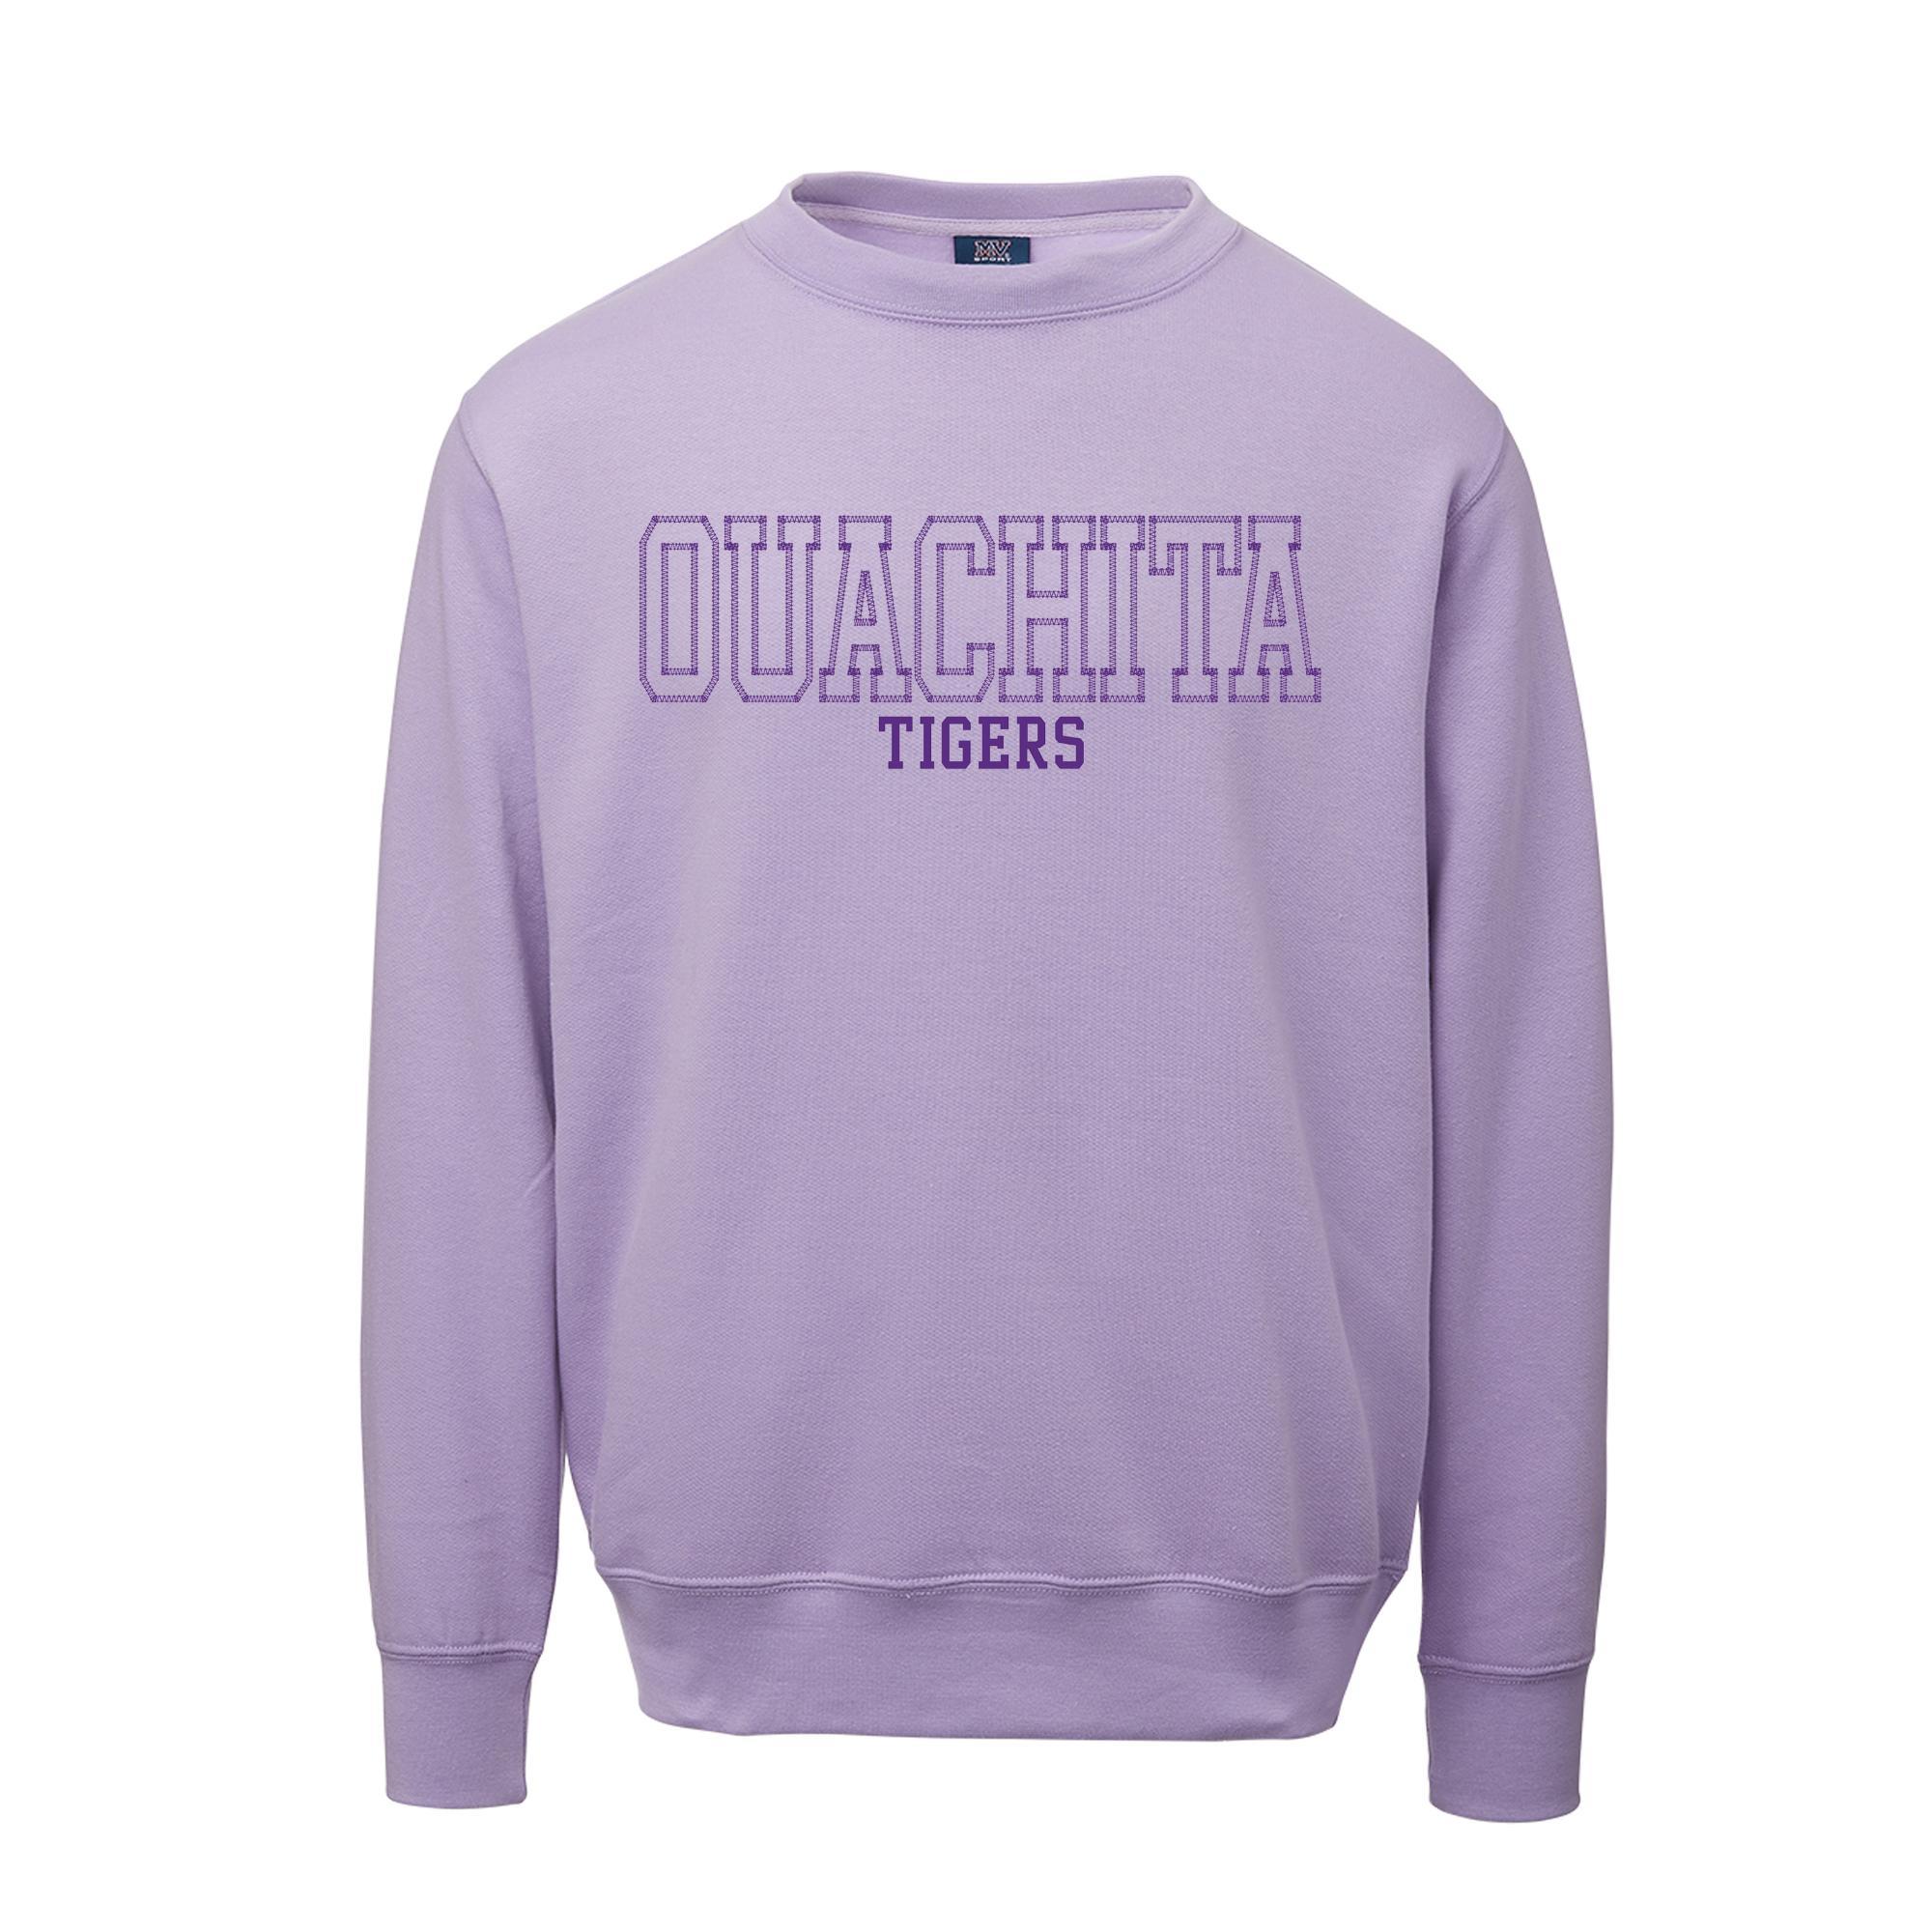 image of: Ouachita Tigers Fundamental Fleece Crew